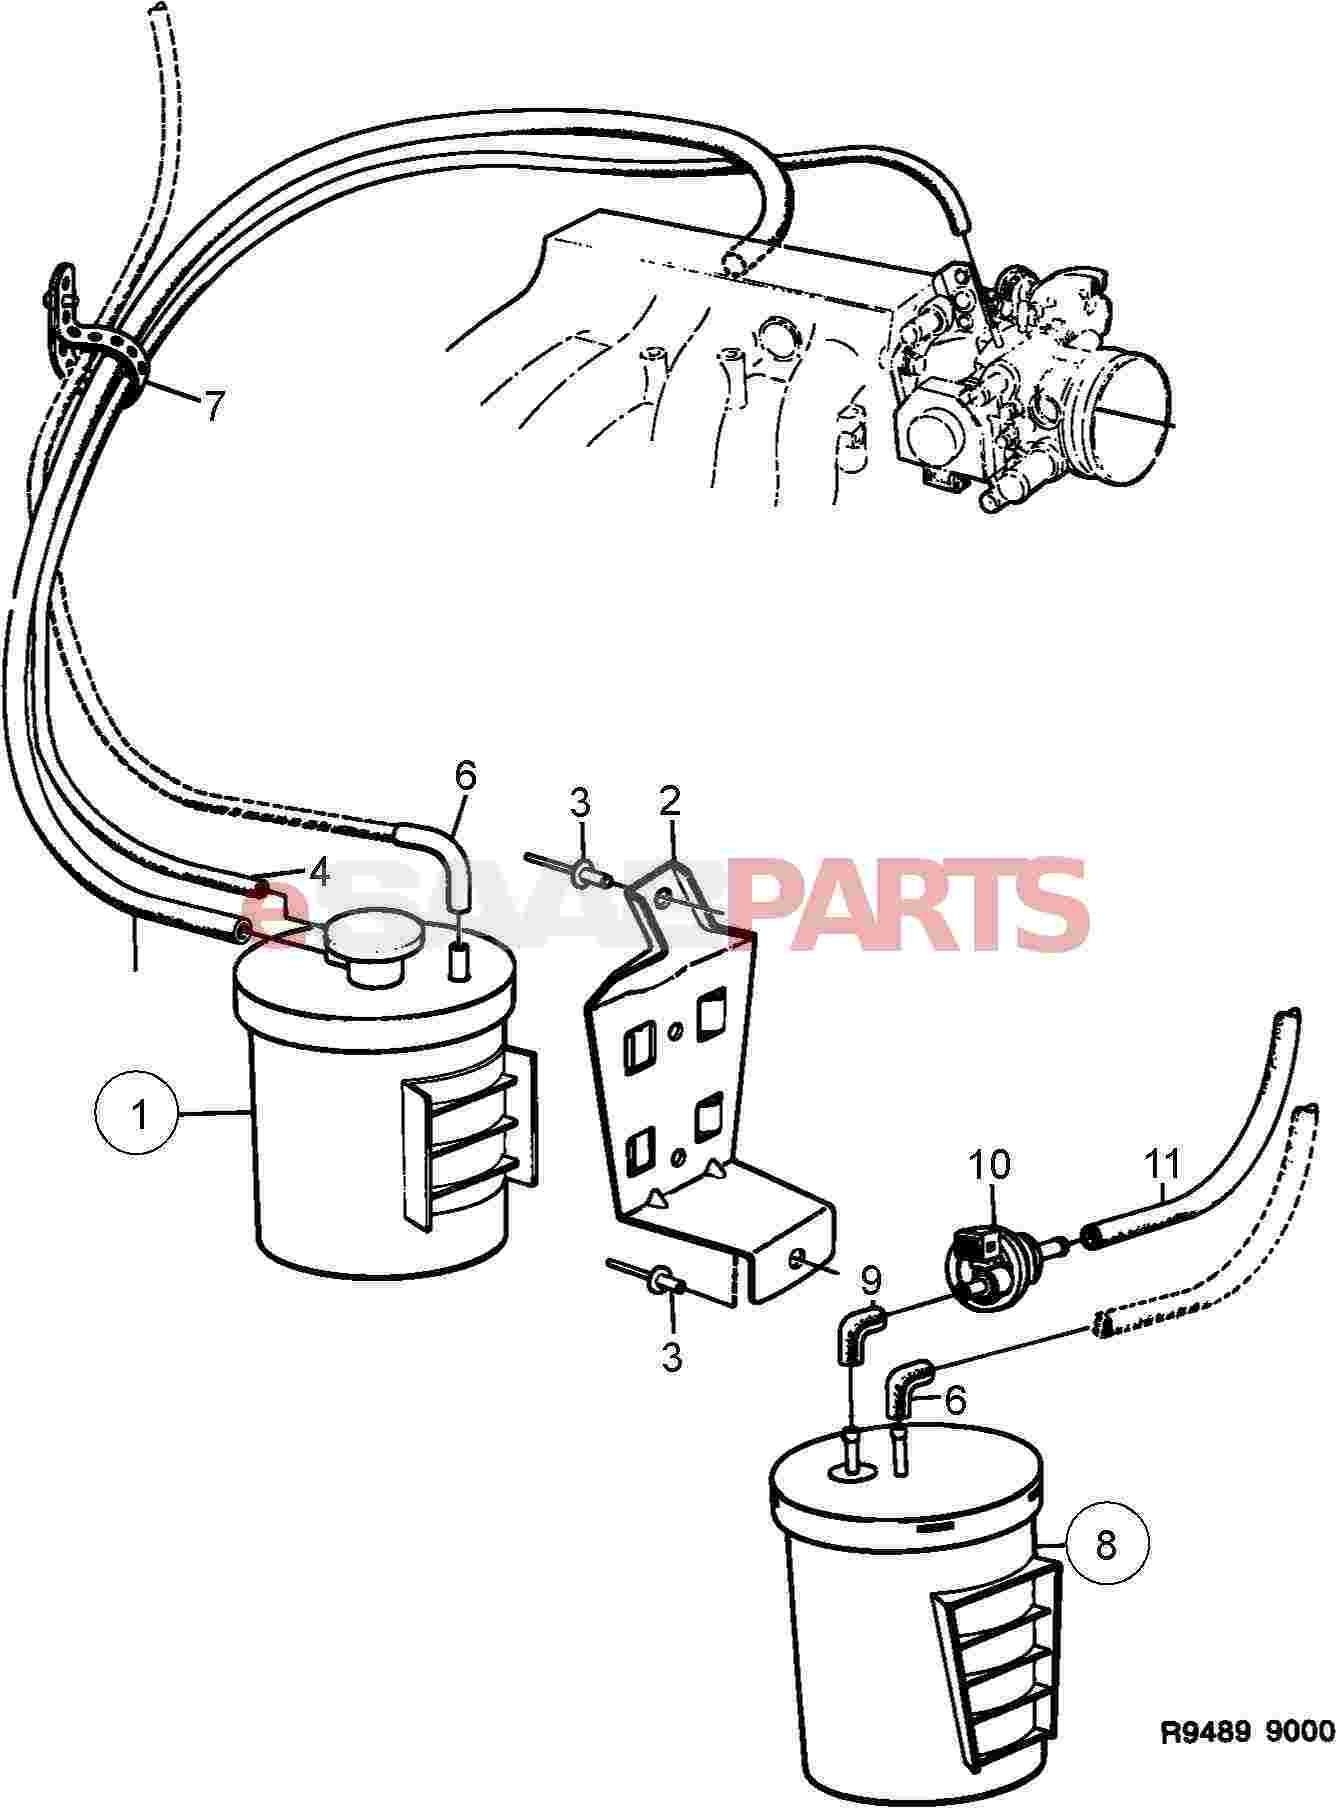 wiring diagram for bmw 335i coolant pump